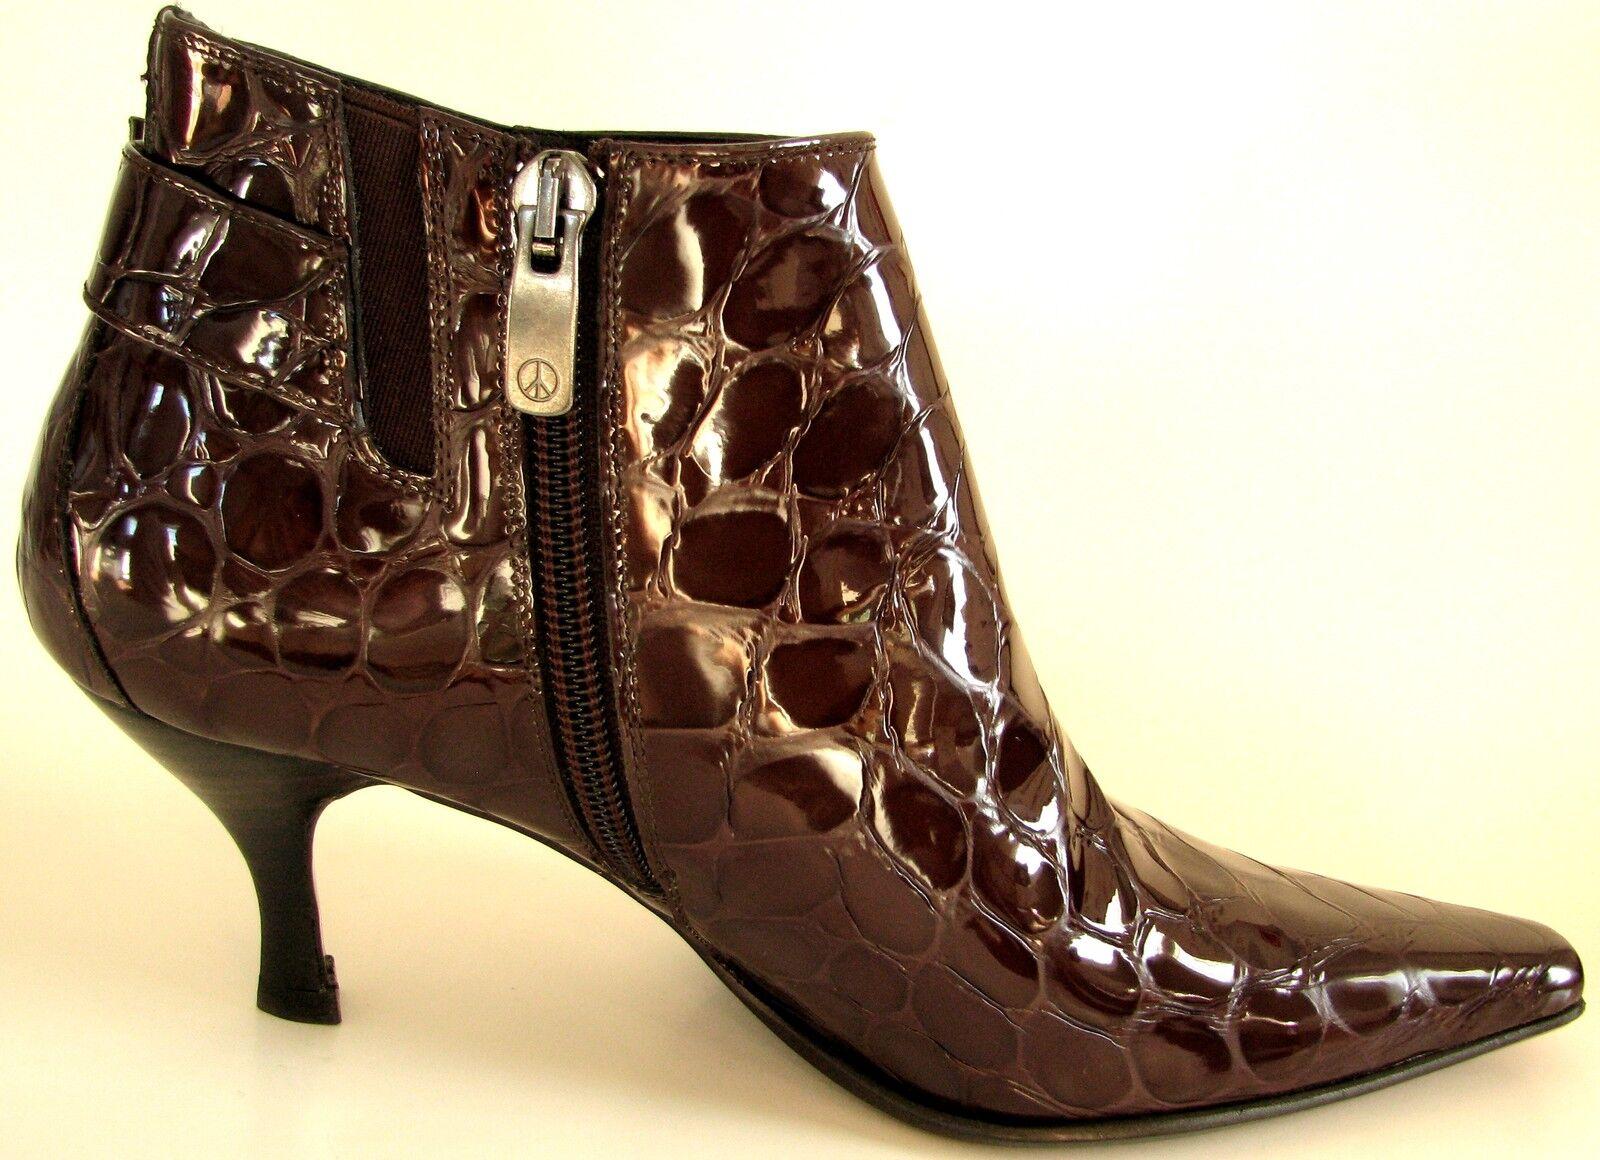 DONALD J J J PLINER LONI Taupe Croco Patent Buckle Mid Heel Ankle Stiefel 6 LOVE schuhe 90c5c7